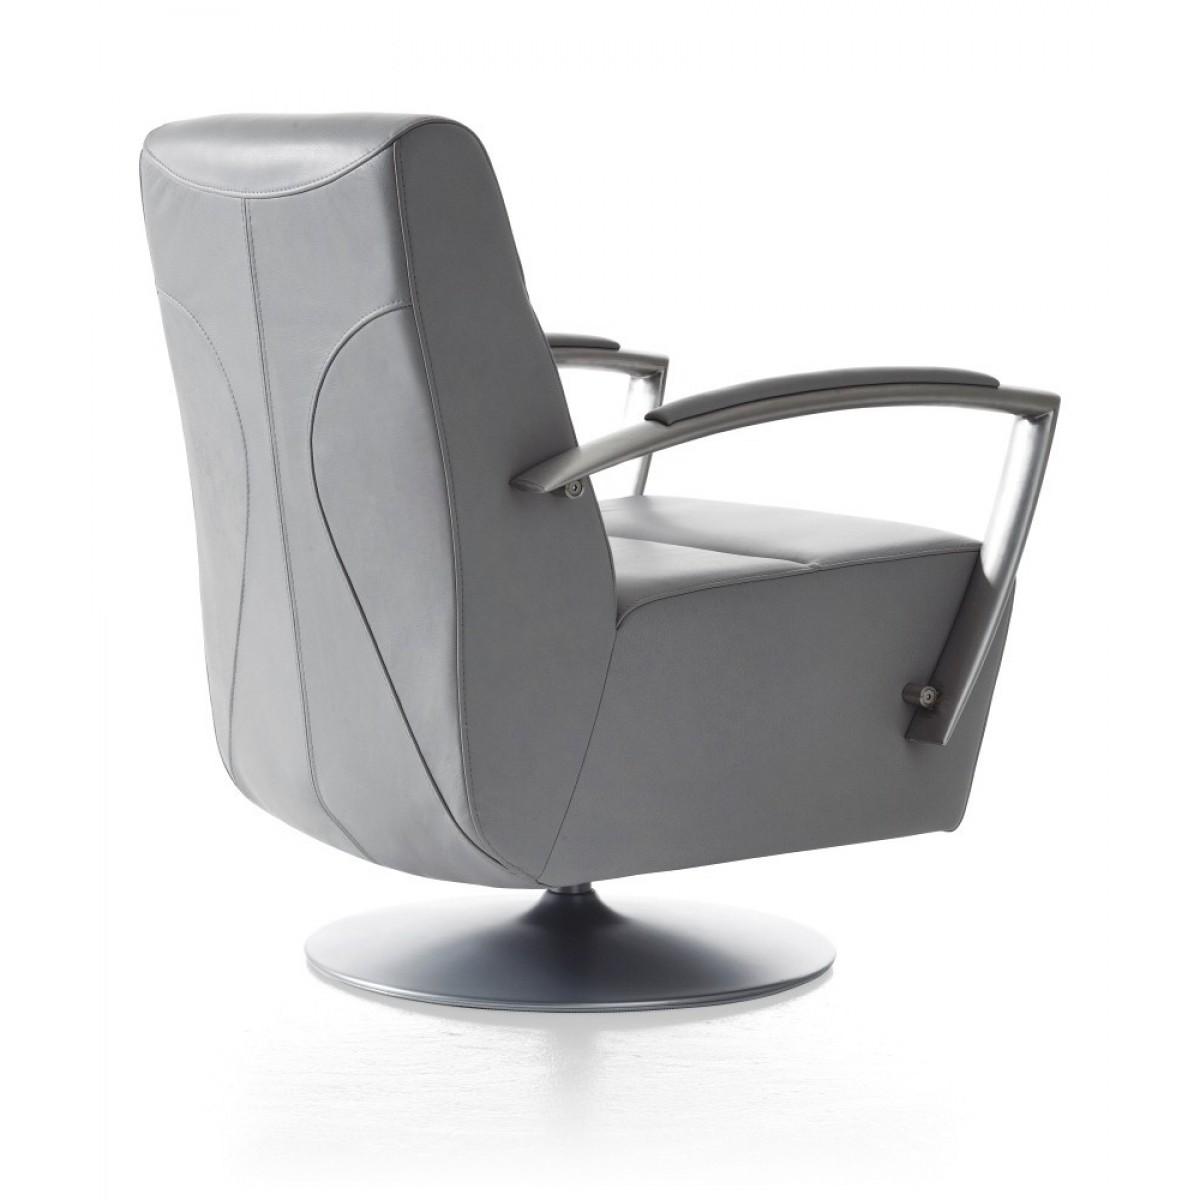 lagos-draai-fauteuil-stof-leer-achter